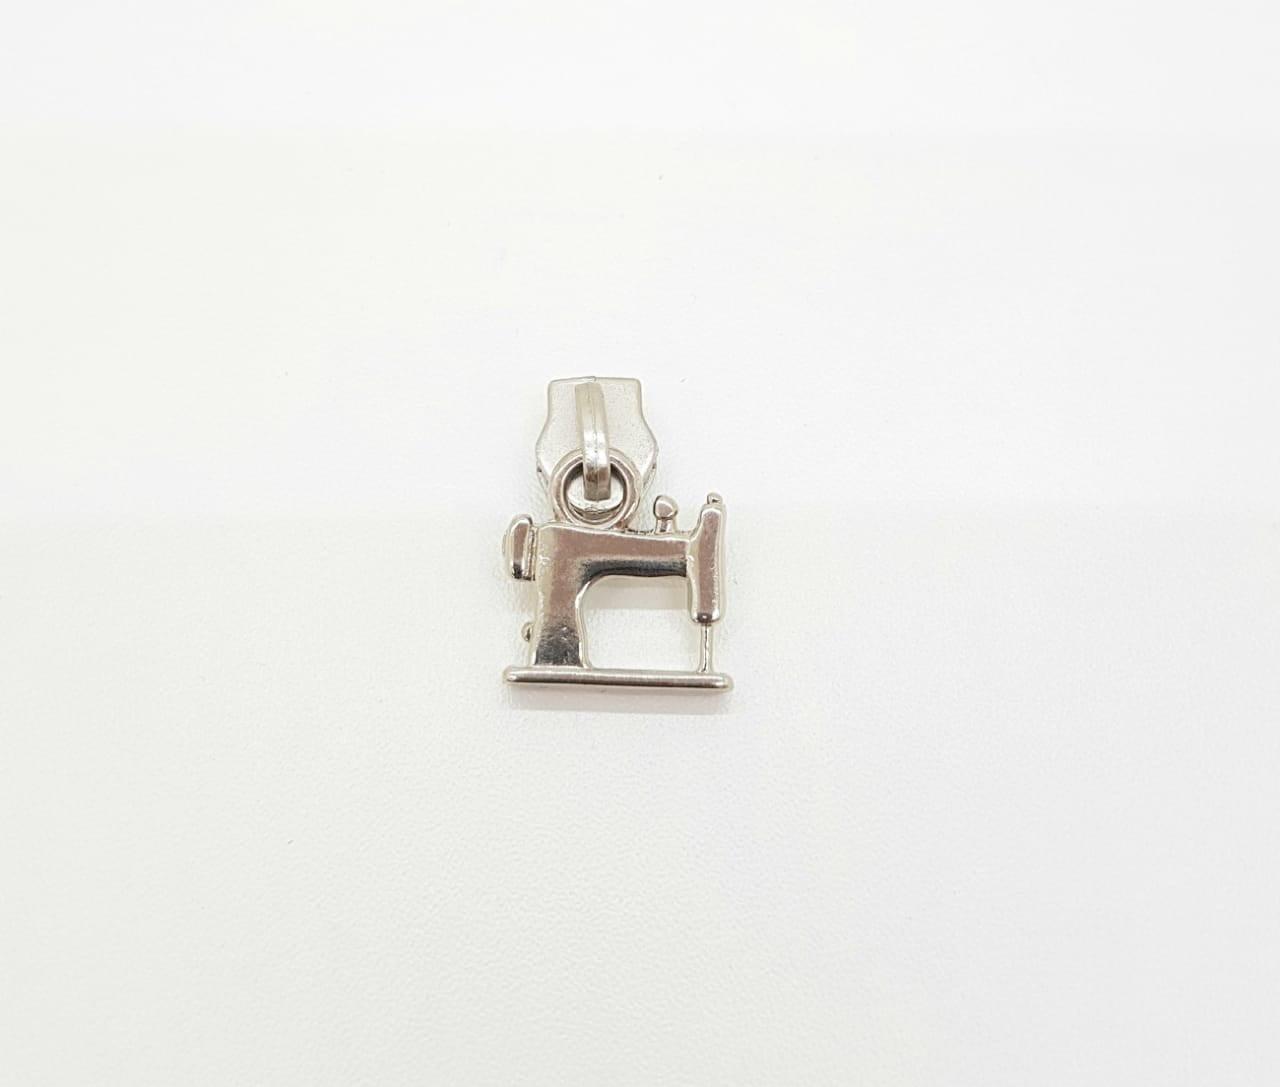 Cursor de zíper 5mm - Máquina de costura - Níquel